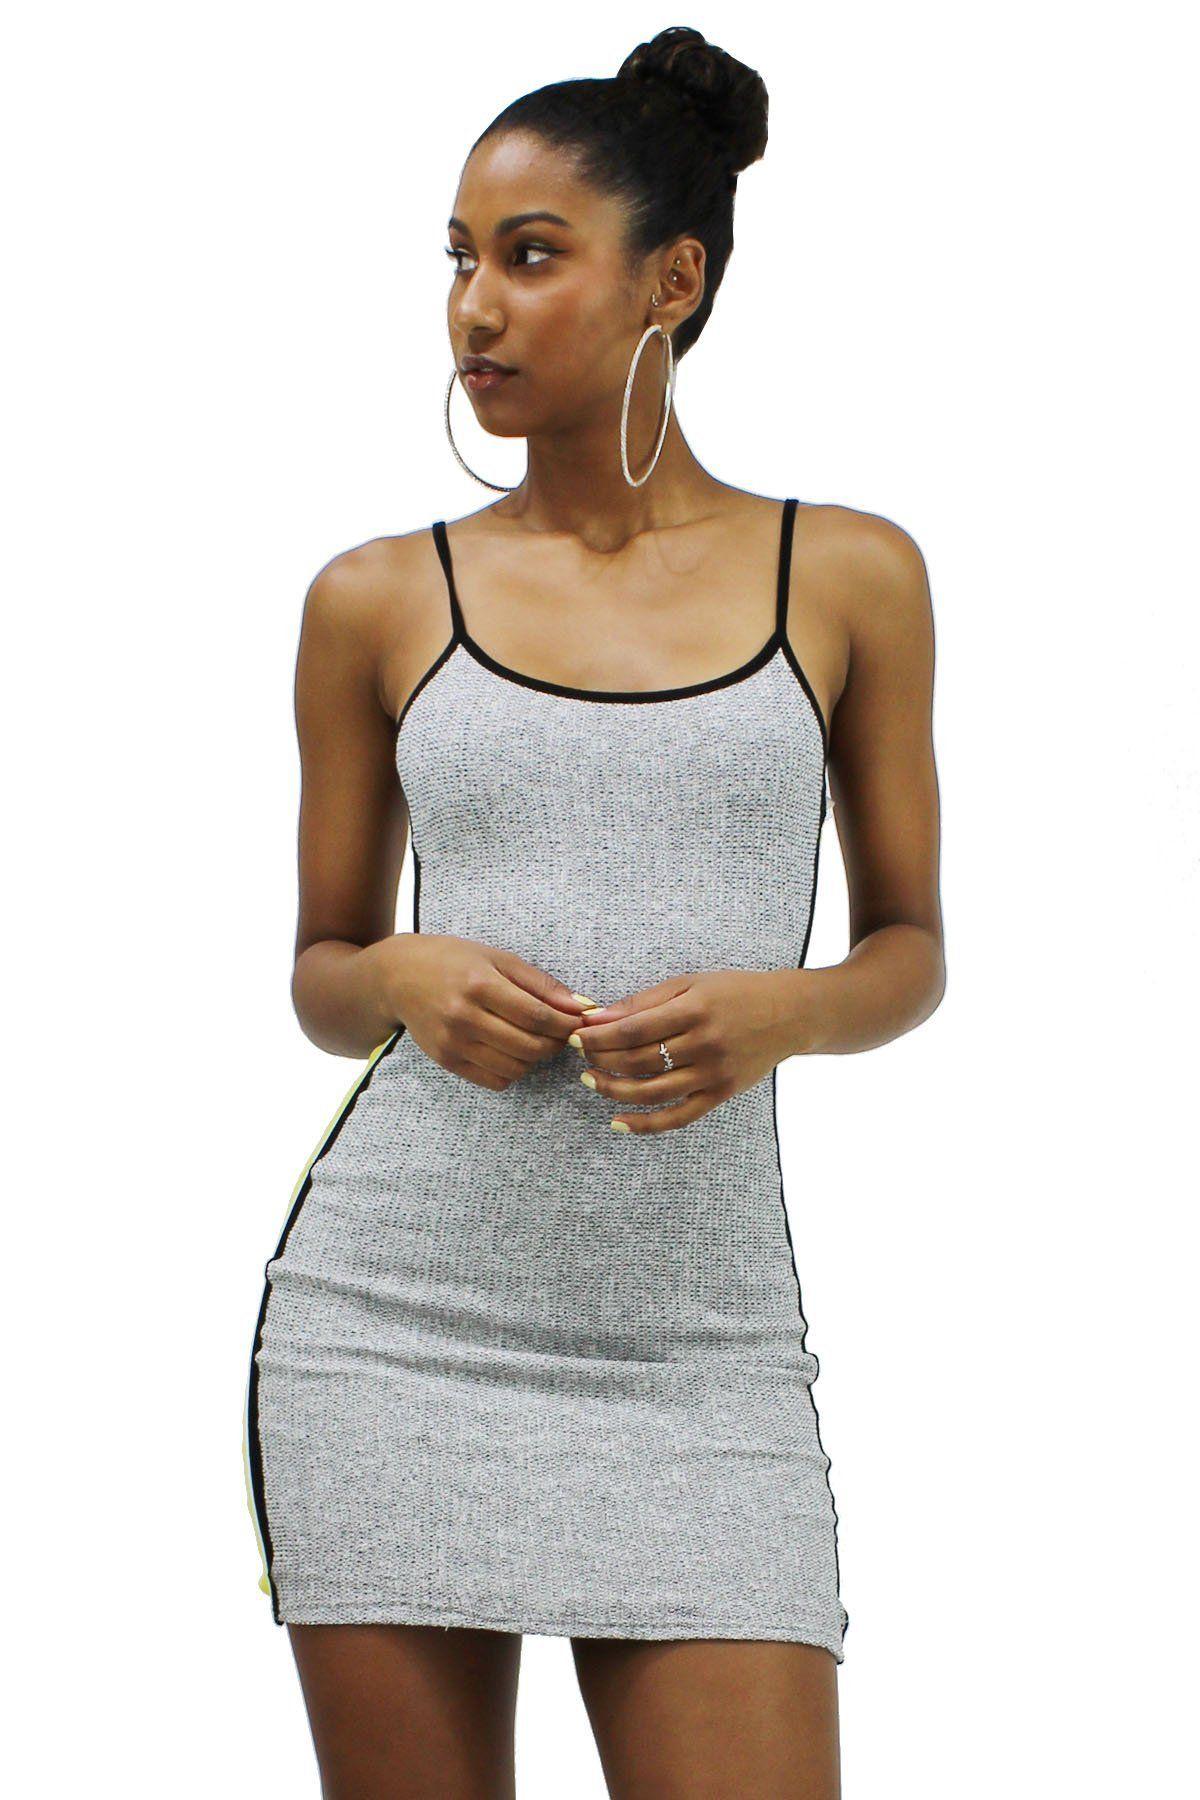 acd5d1b44e Round neck spaghetti strap contrast striped mini dress ael ddf jpg  1200x1800 Ddf dress